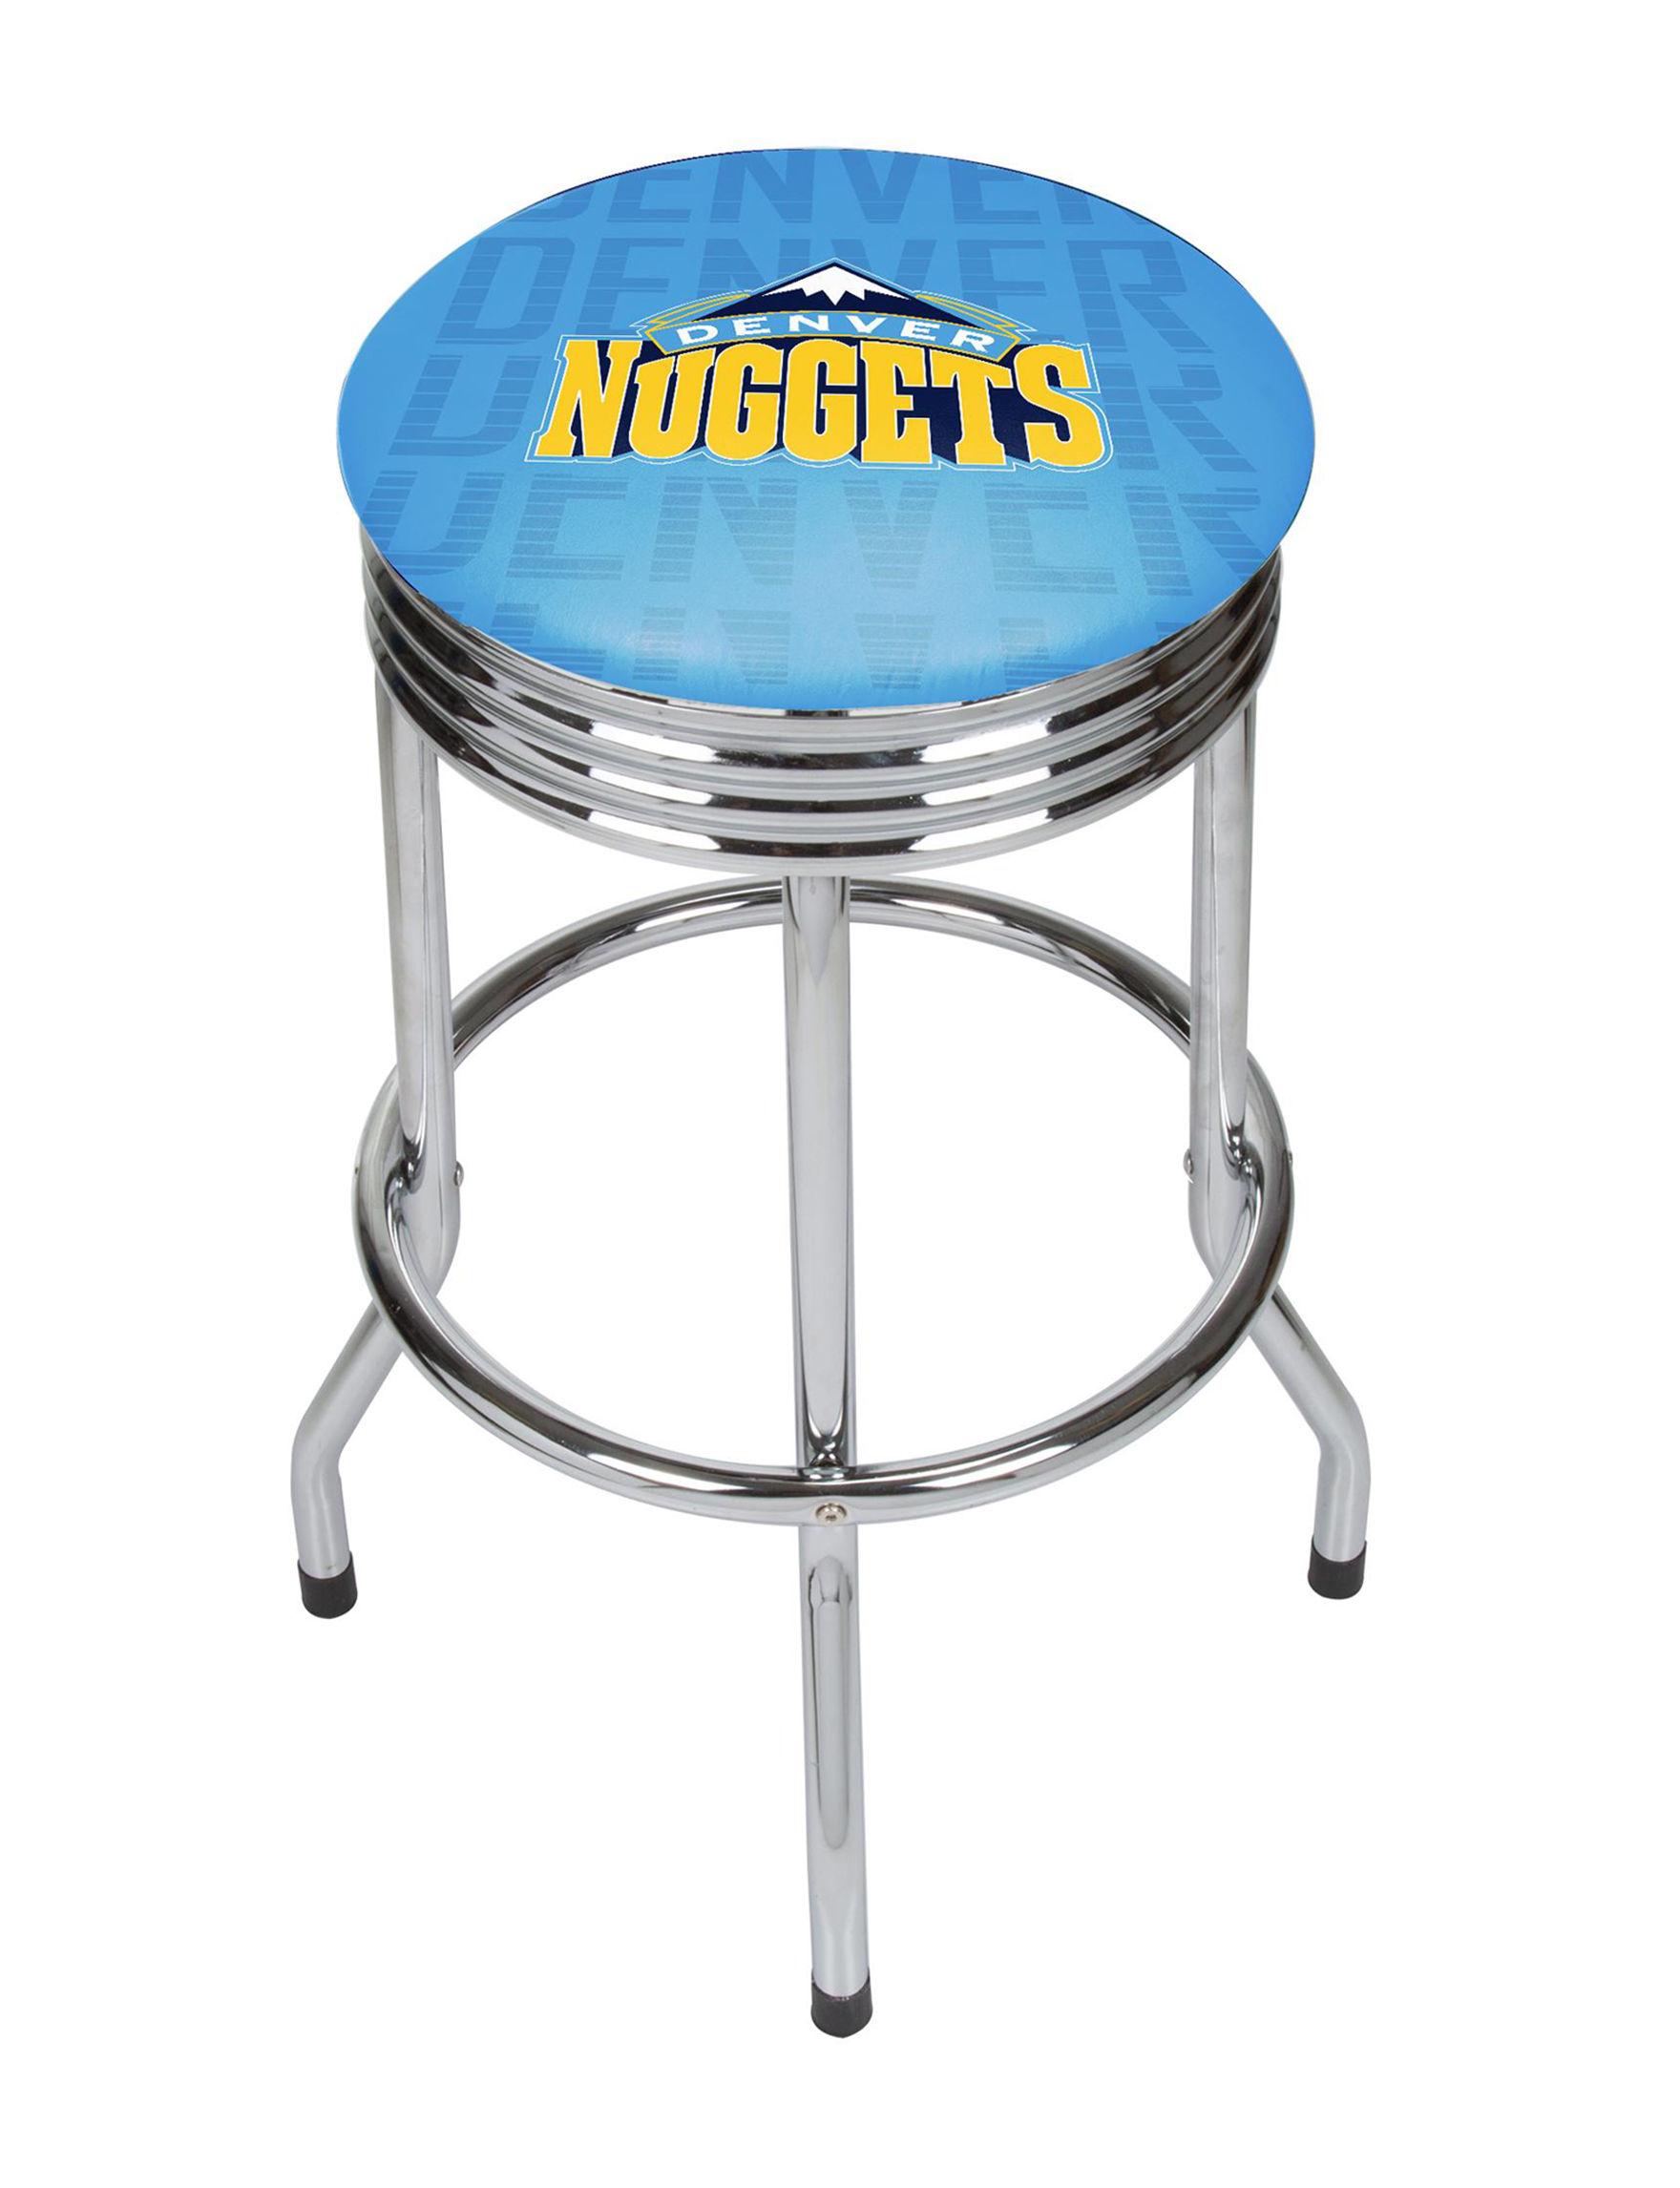 NBA Blue / Yellow Bar & Kitchen Stools Kitchen & Dining Furniture